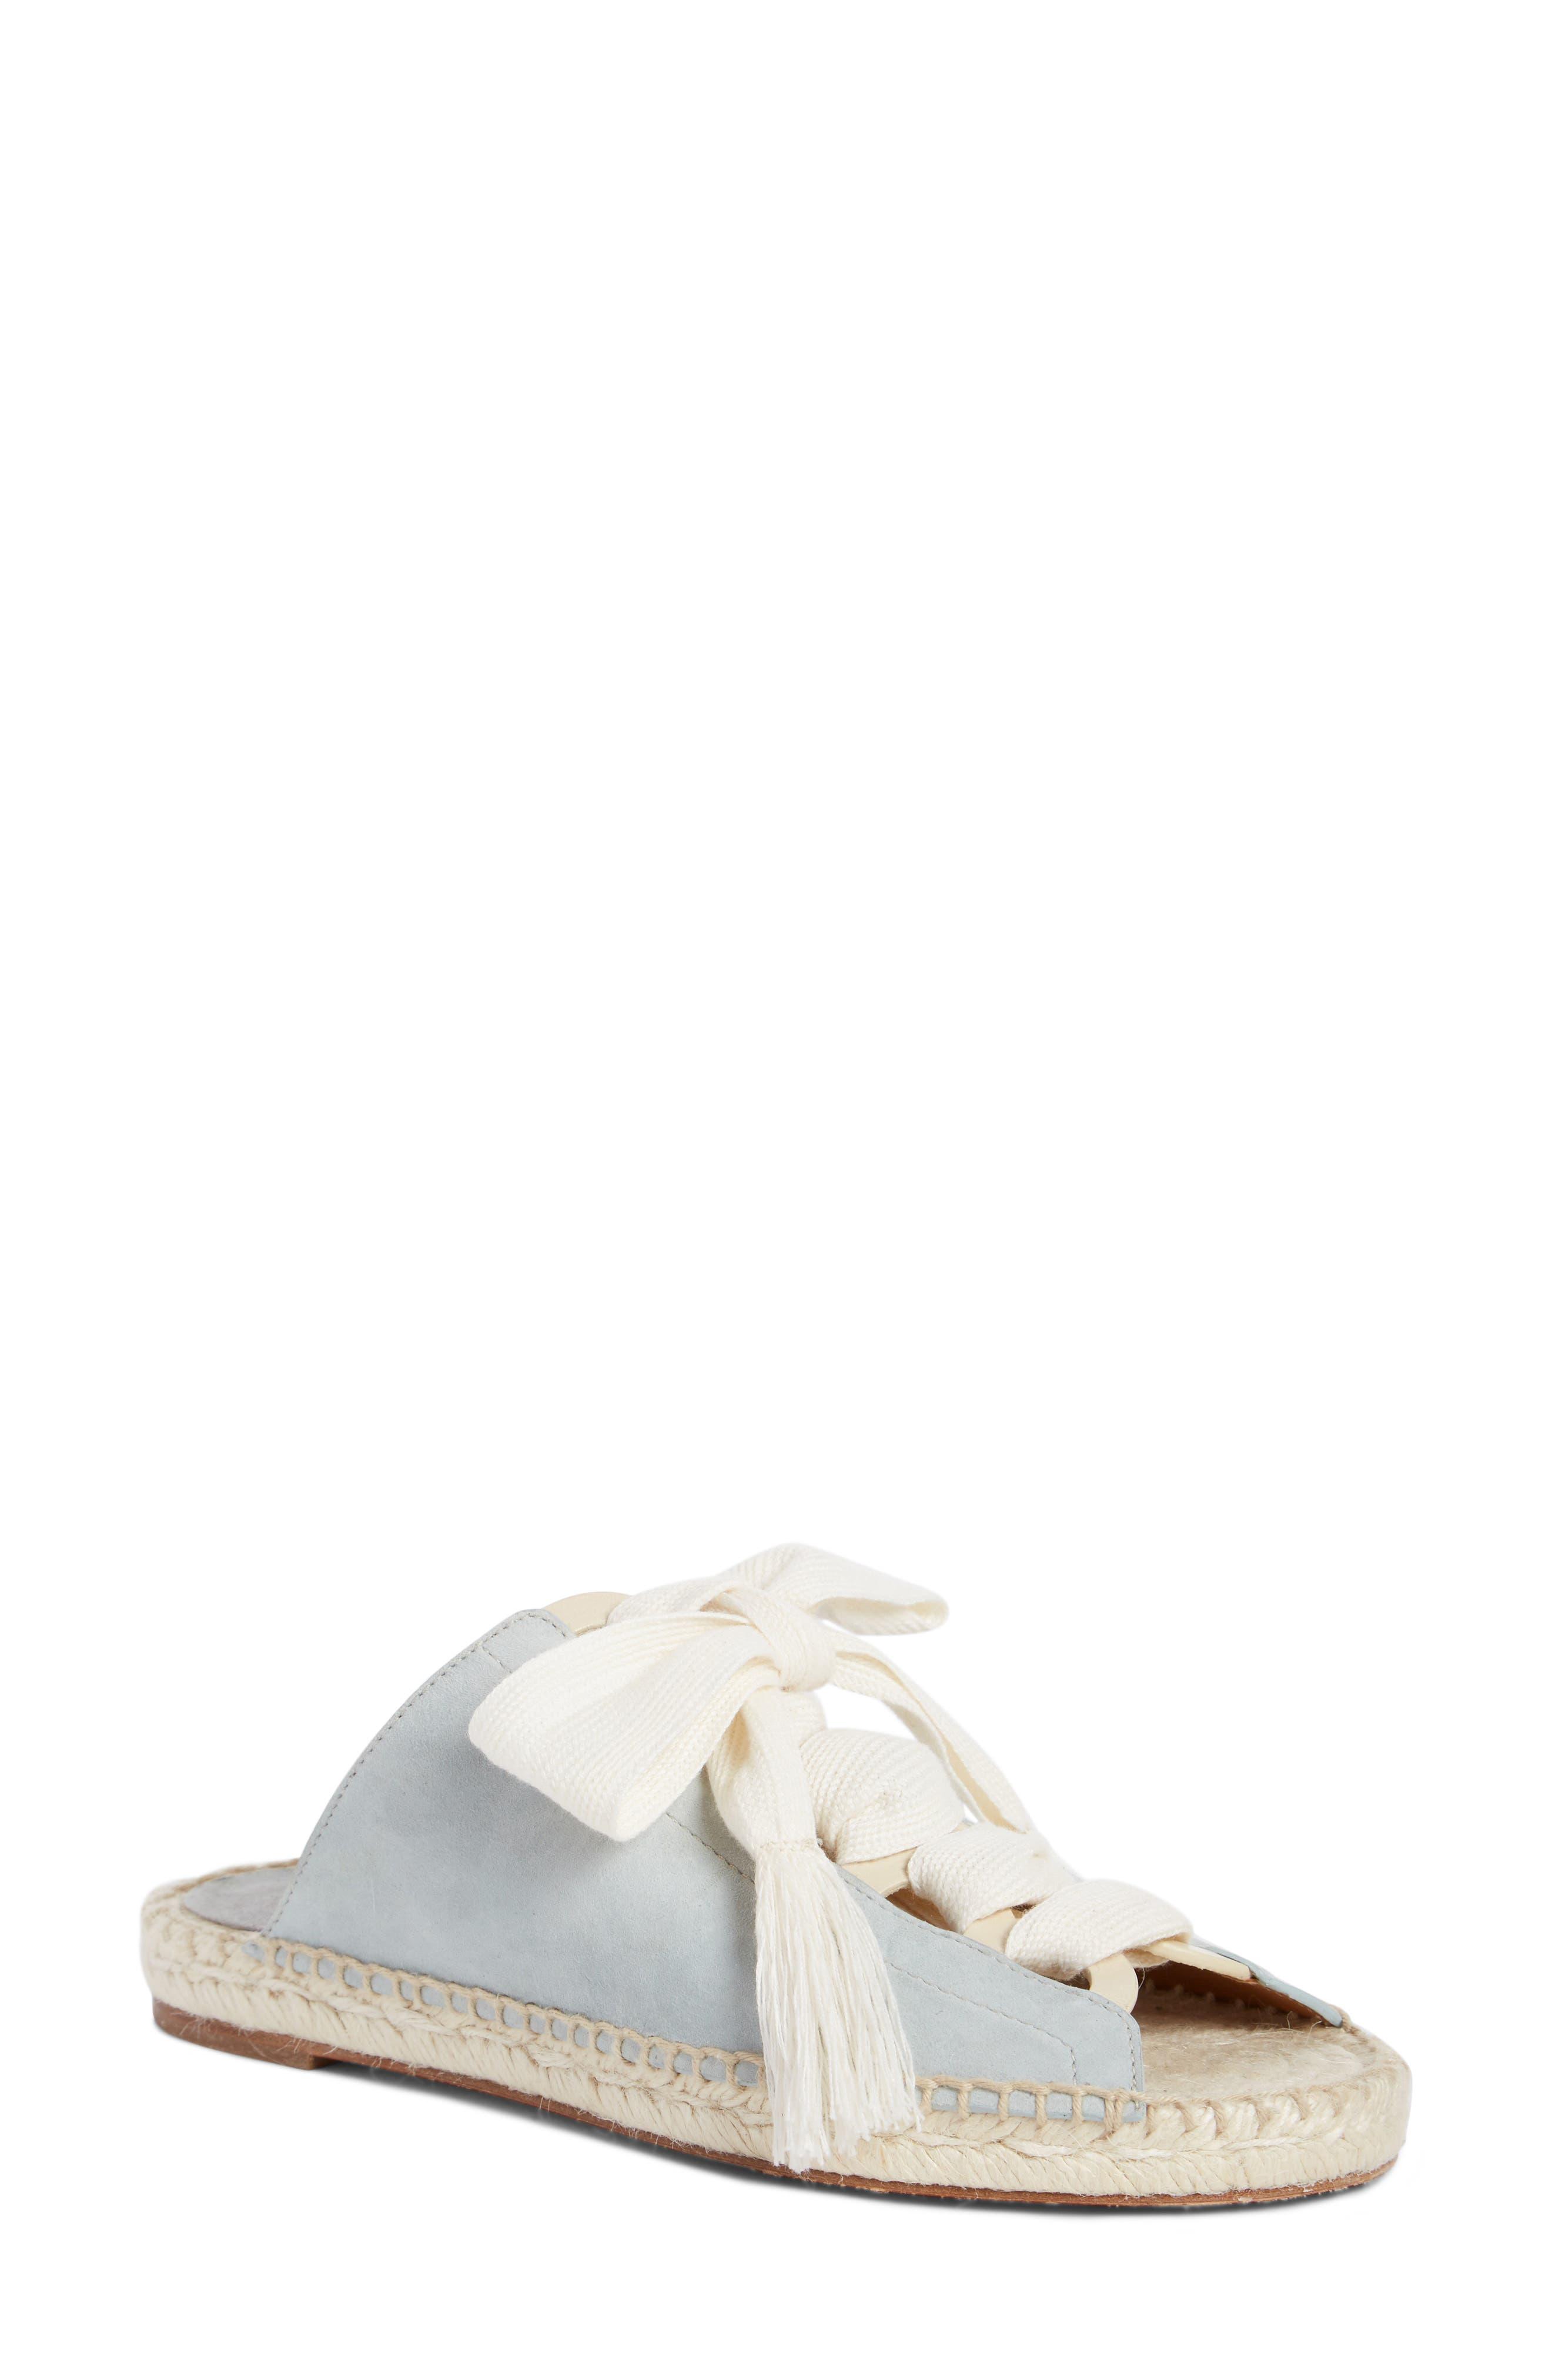 Main Image - Chloé Harper Lace-Up Espadrille Slide Sandal (Women)